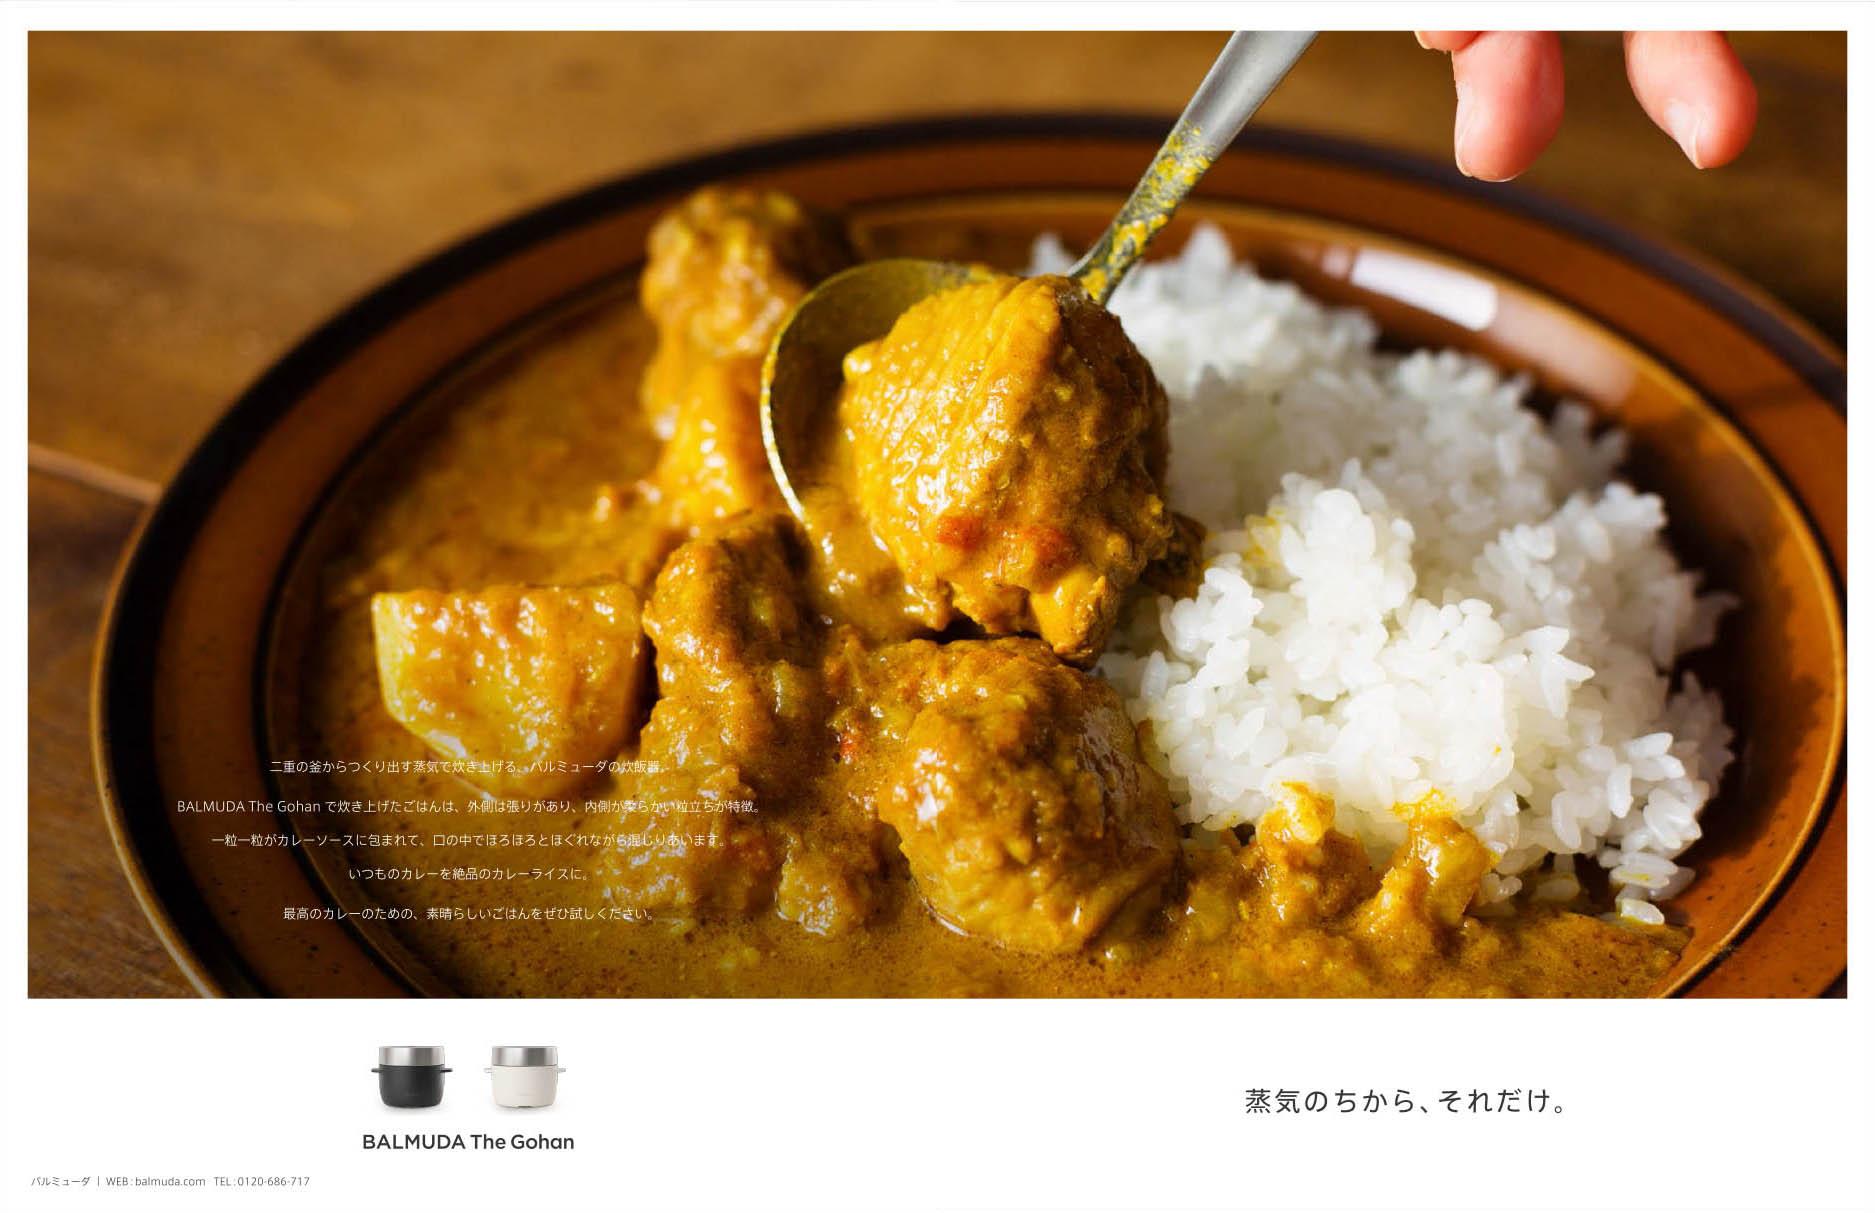 Rice_BALMUDA_170428